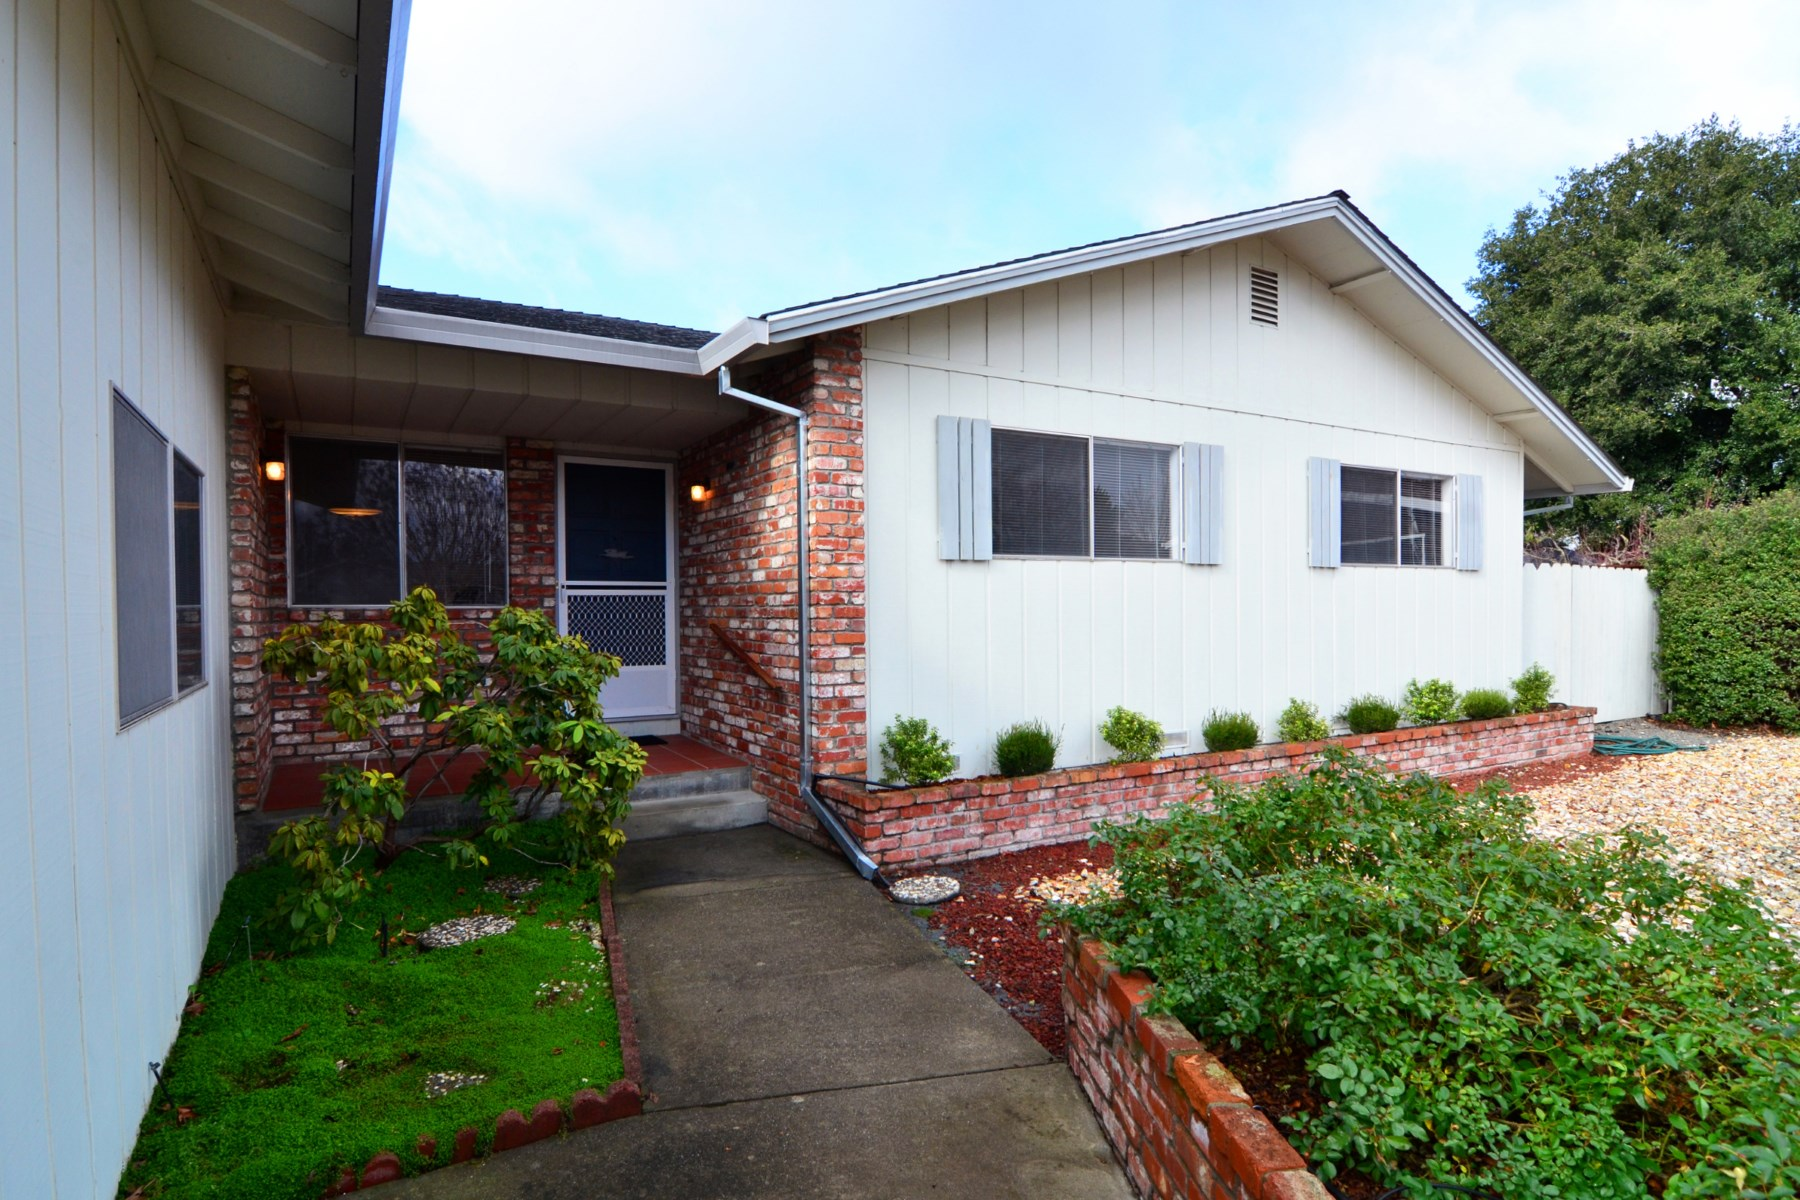 Single Family Home for Sale at 763 Garland Avenue, Sonoma Sonoma, California 95476 United States